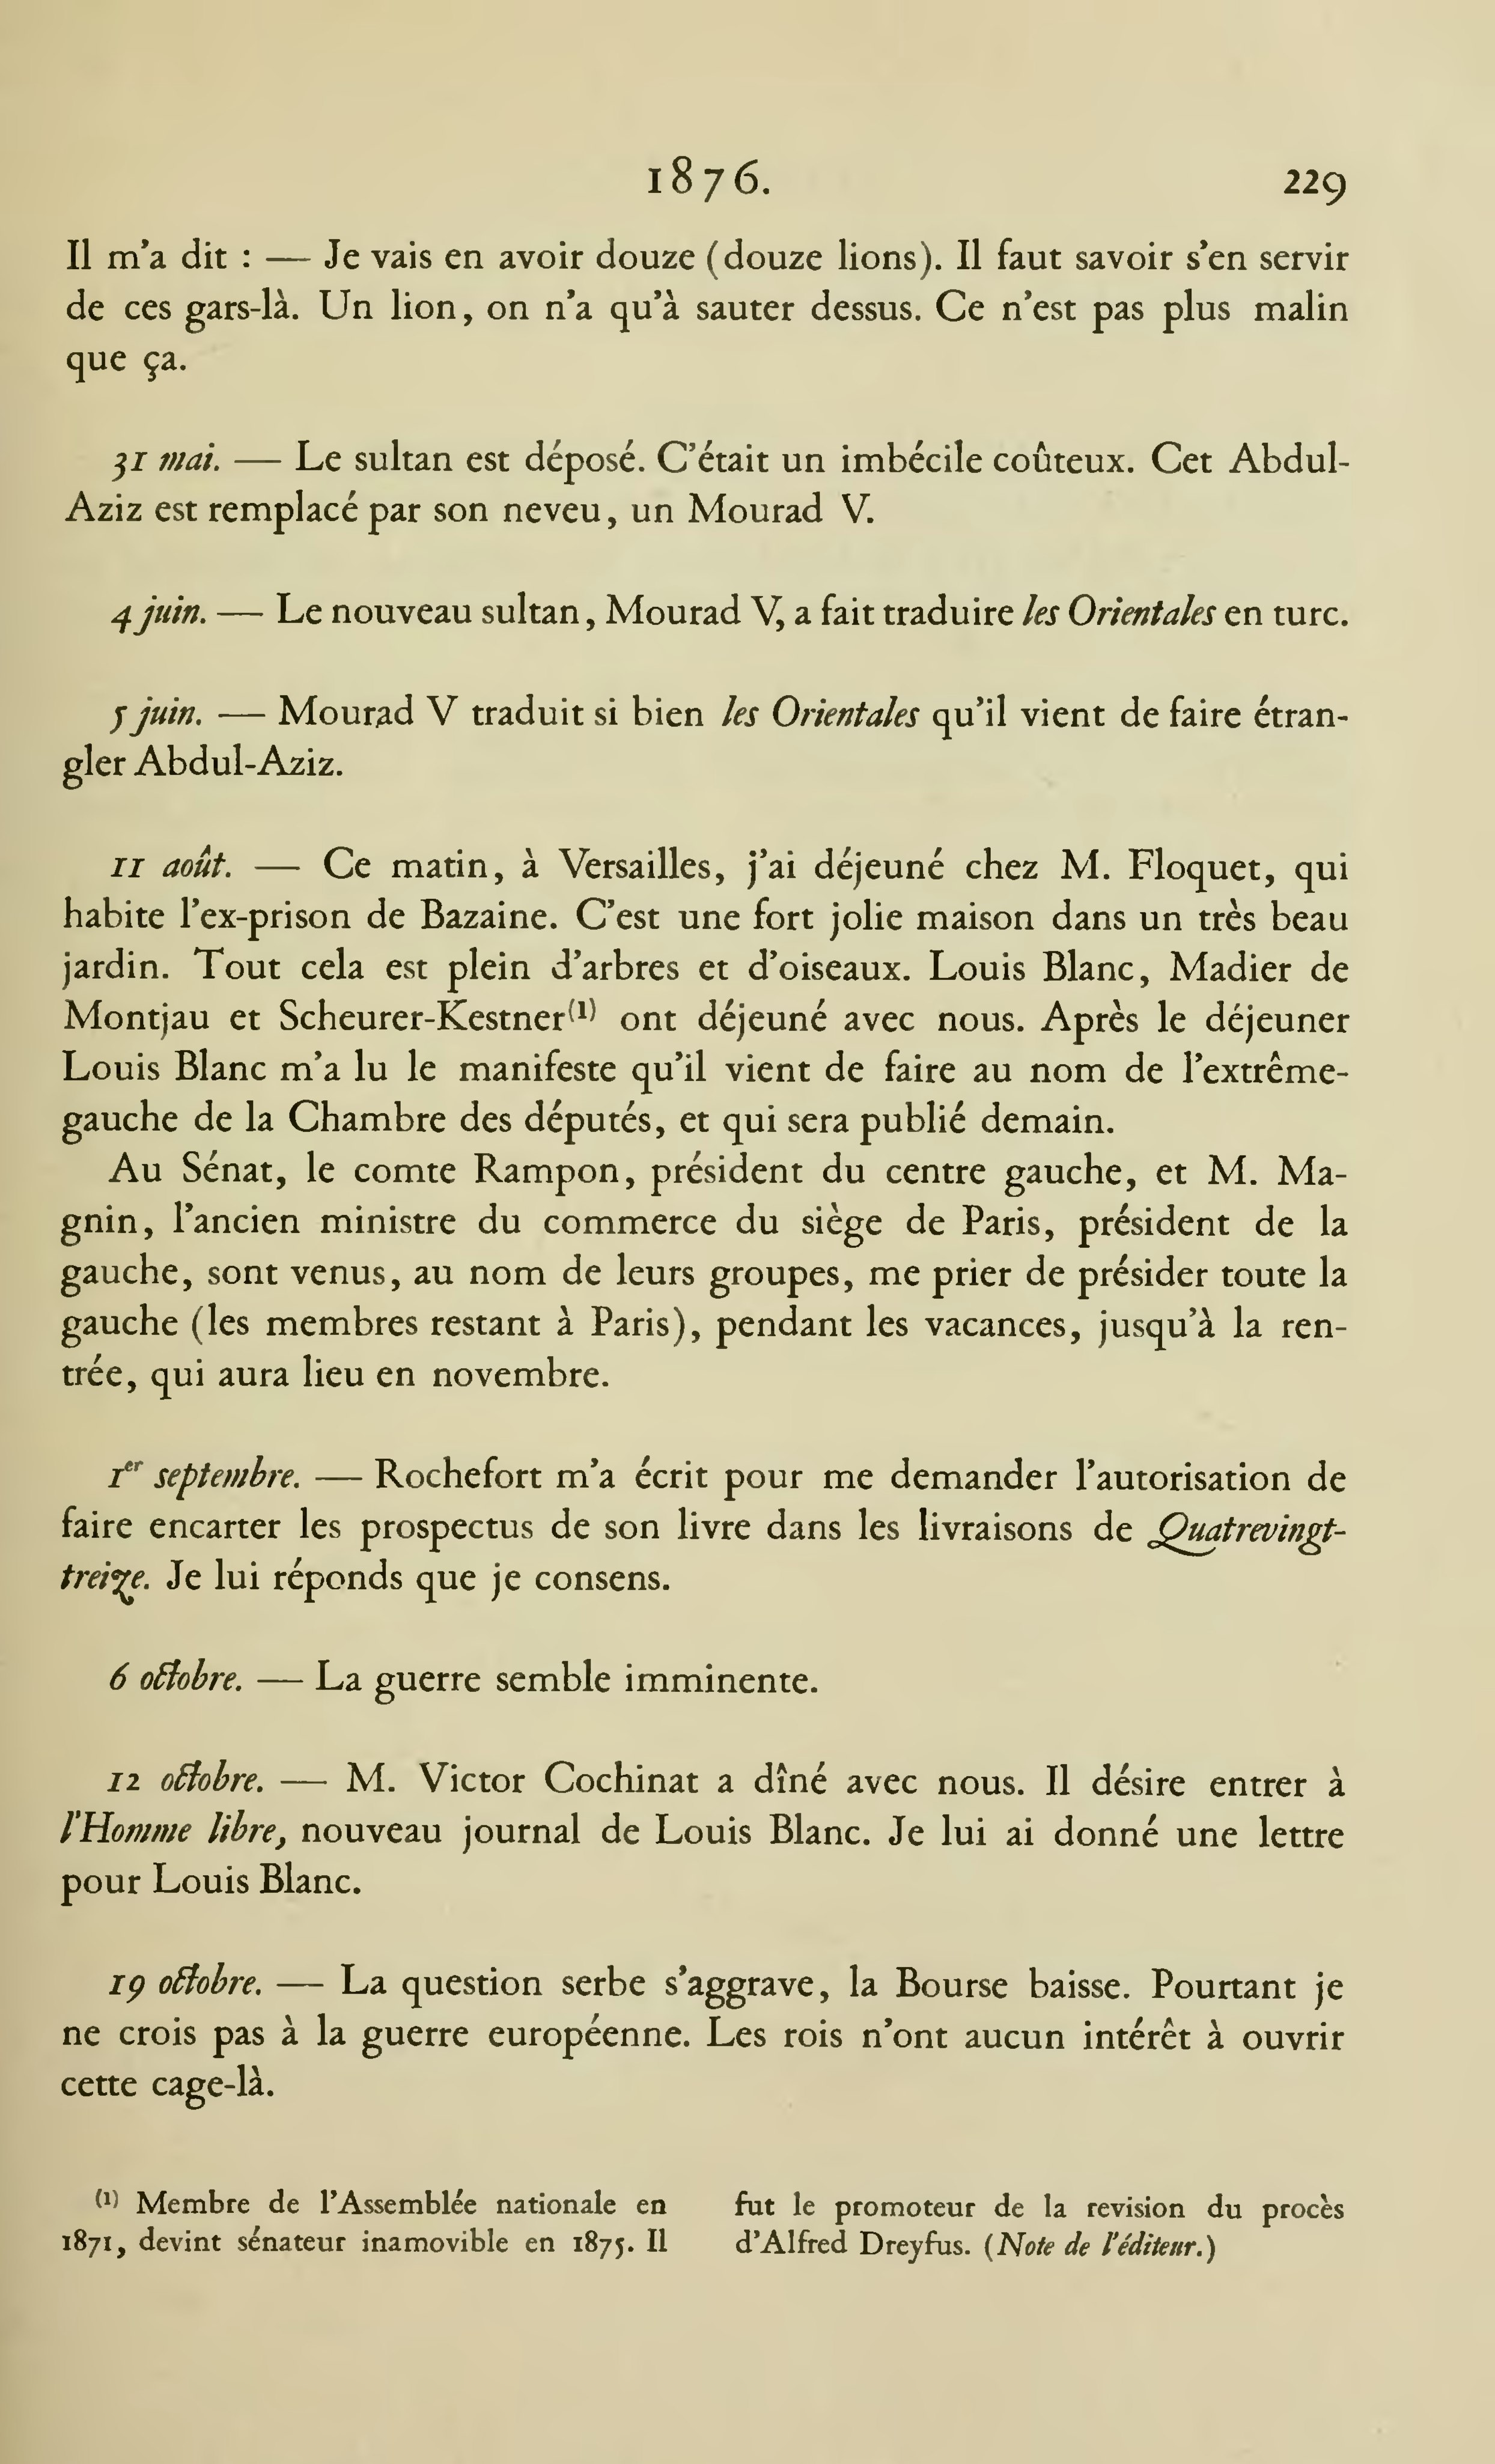 Page Hugo œuvres Complètes Impr Nat Choses Vues Tome